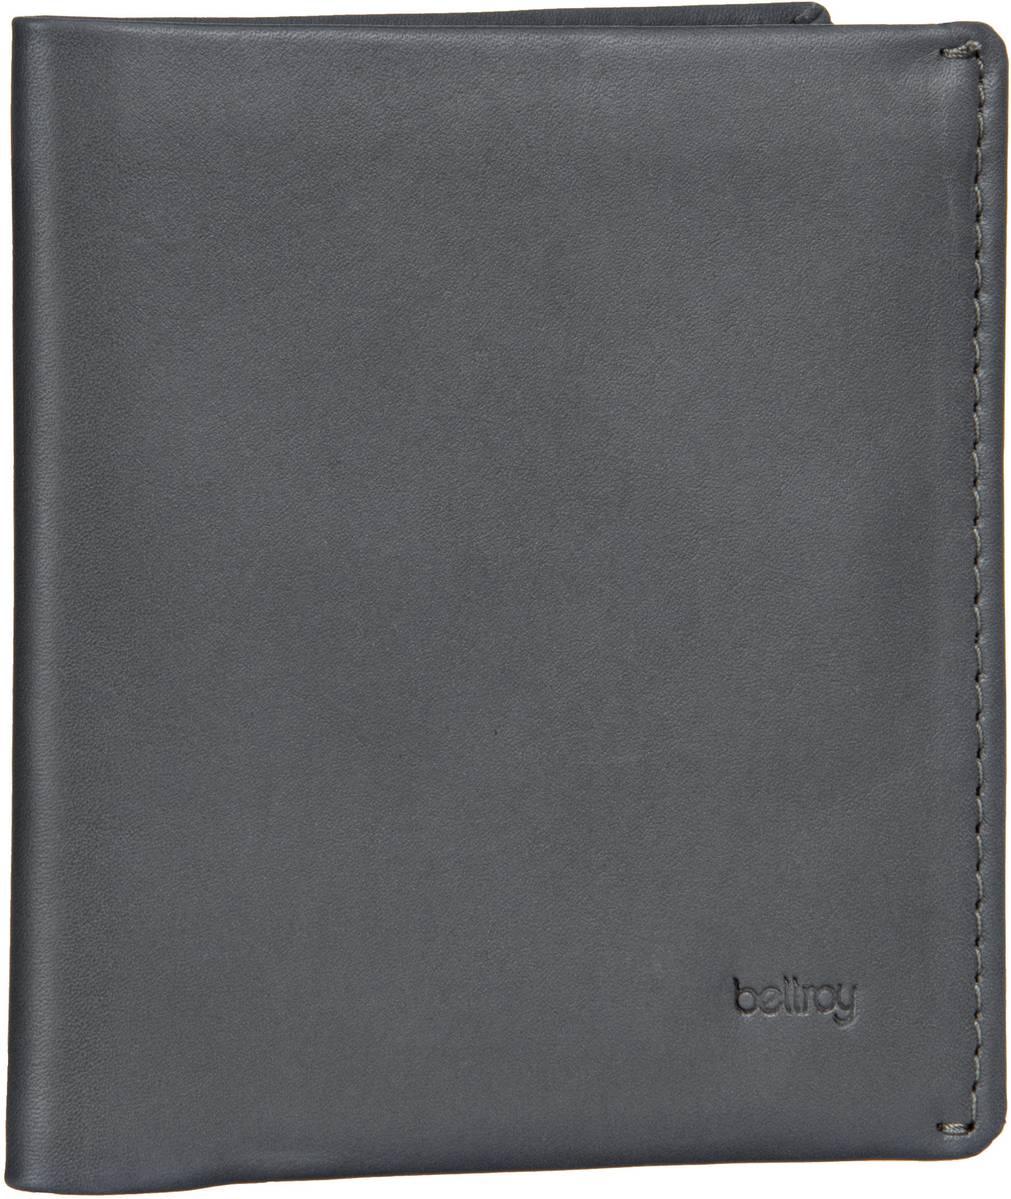 Bellroy Note Sleeve Charcoal - Geldbörse jetztbilligerkaufen